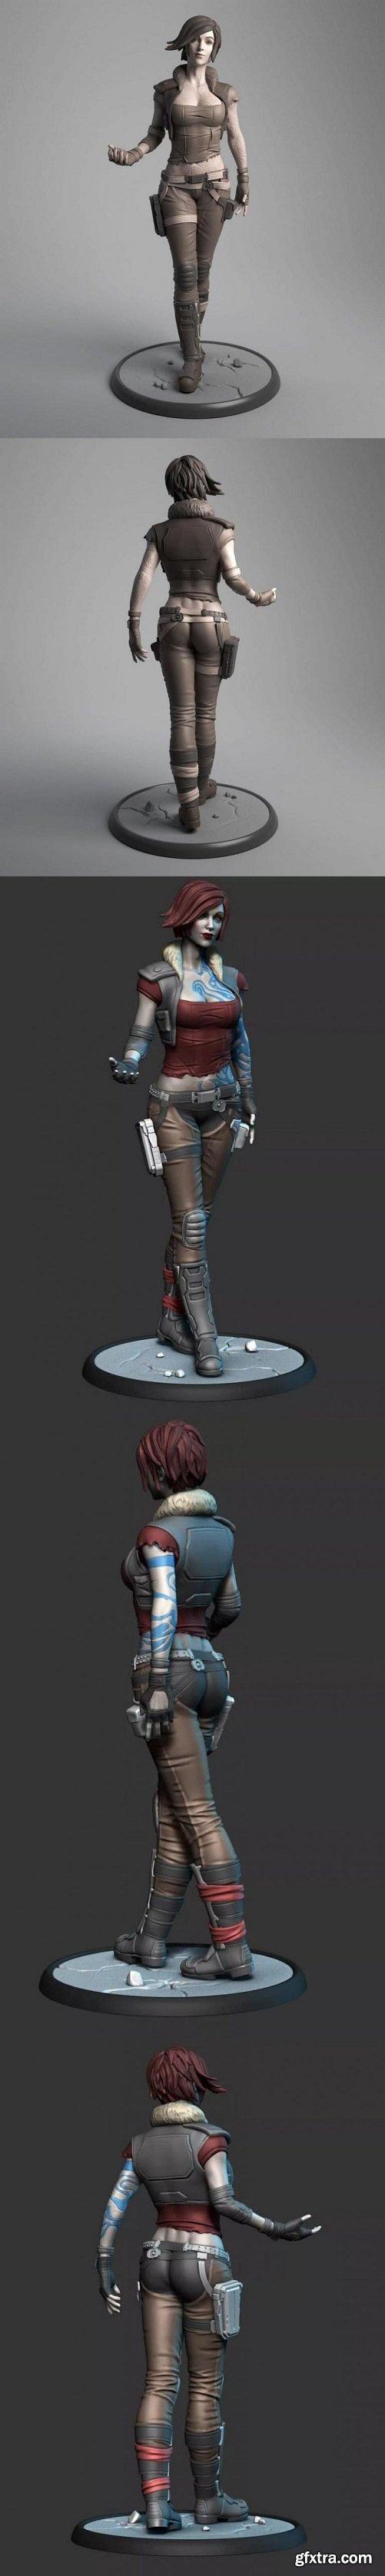 Lilith - Borderlands - 3D Print Model